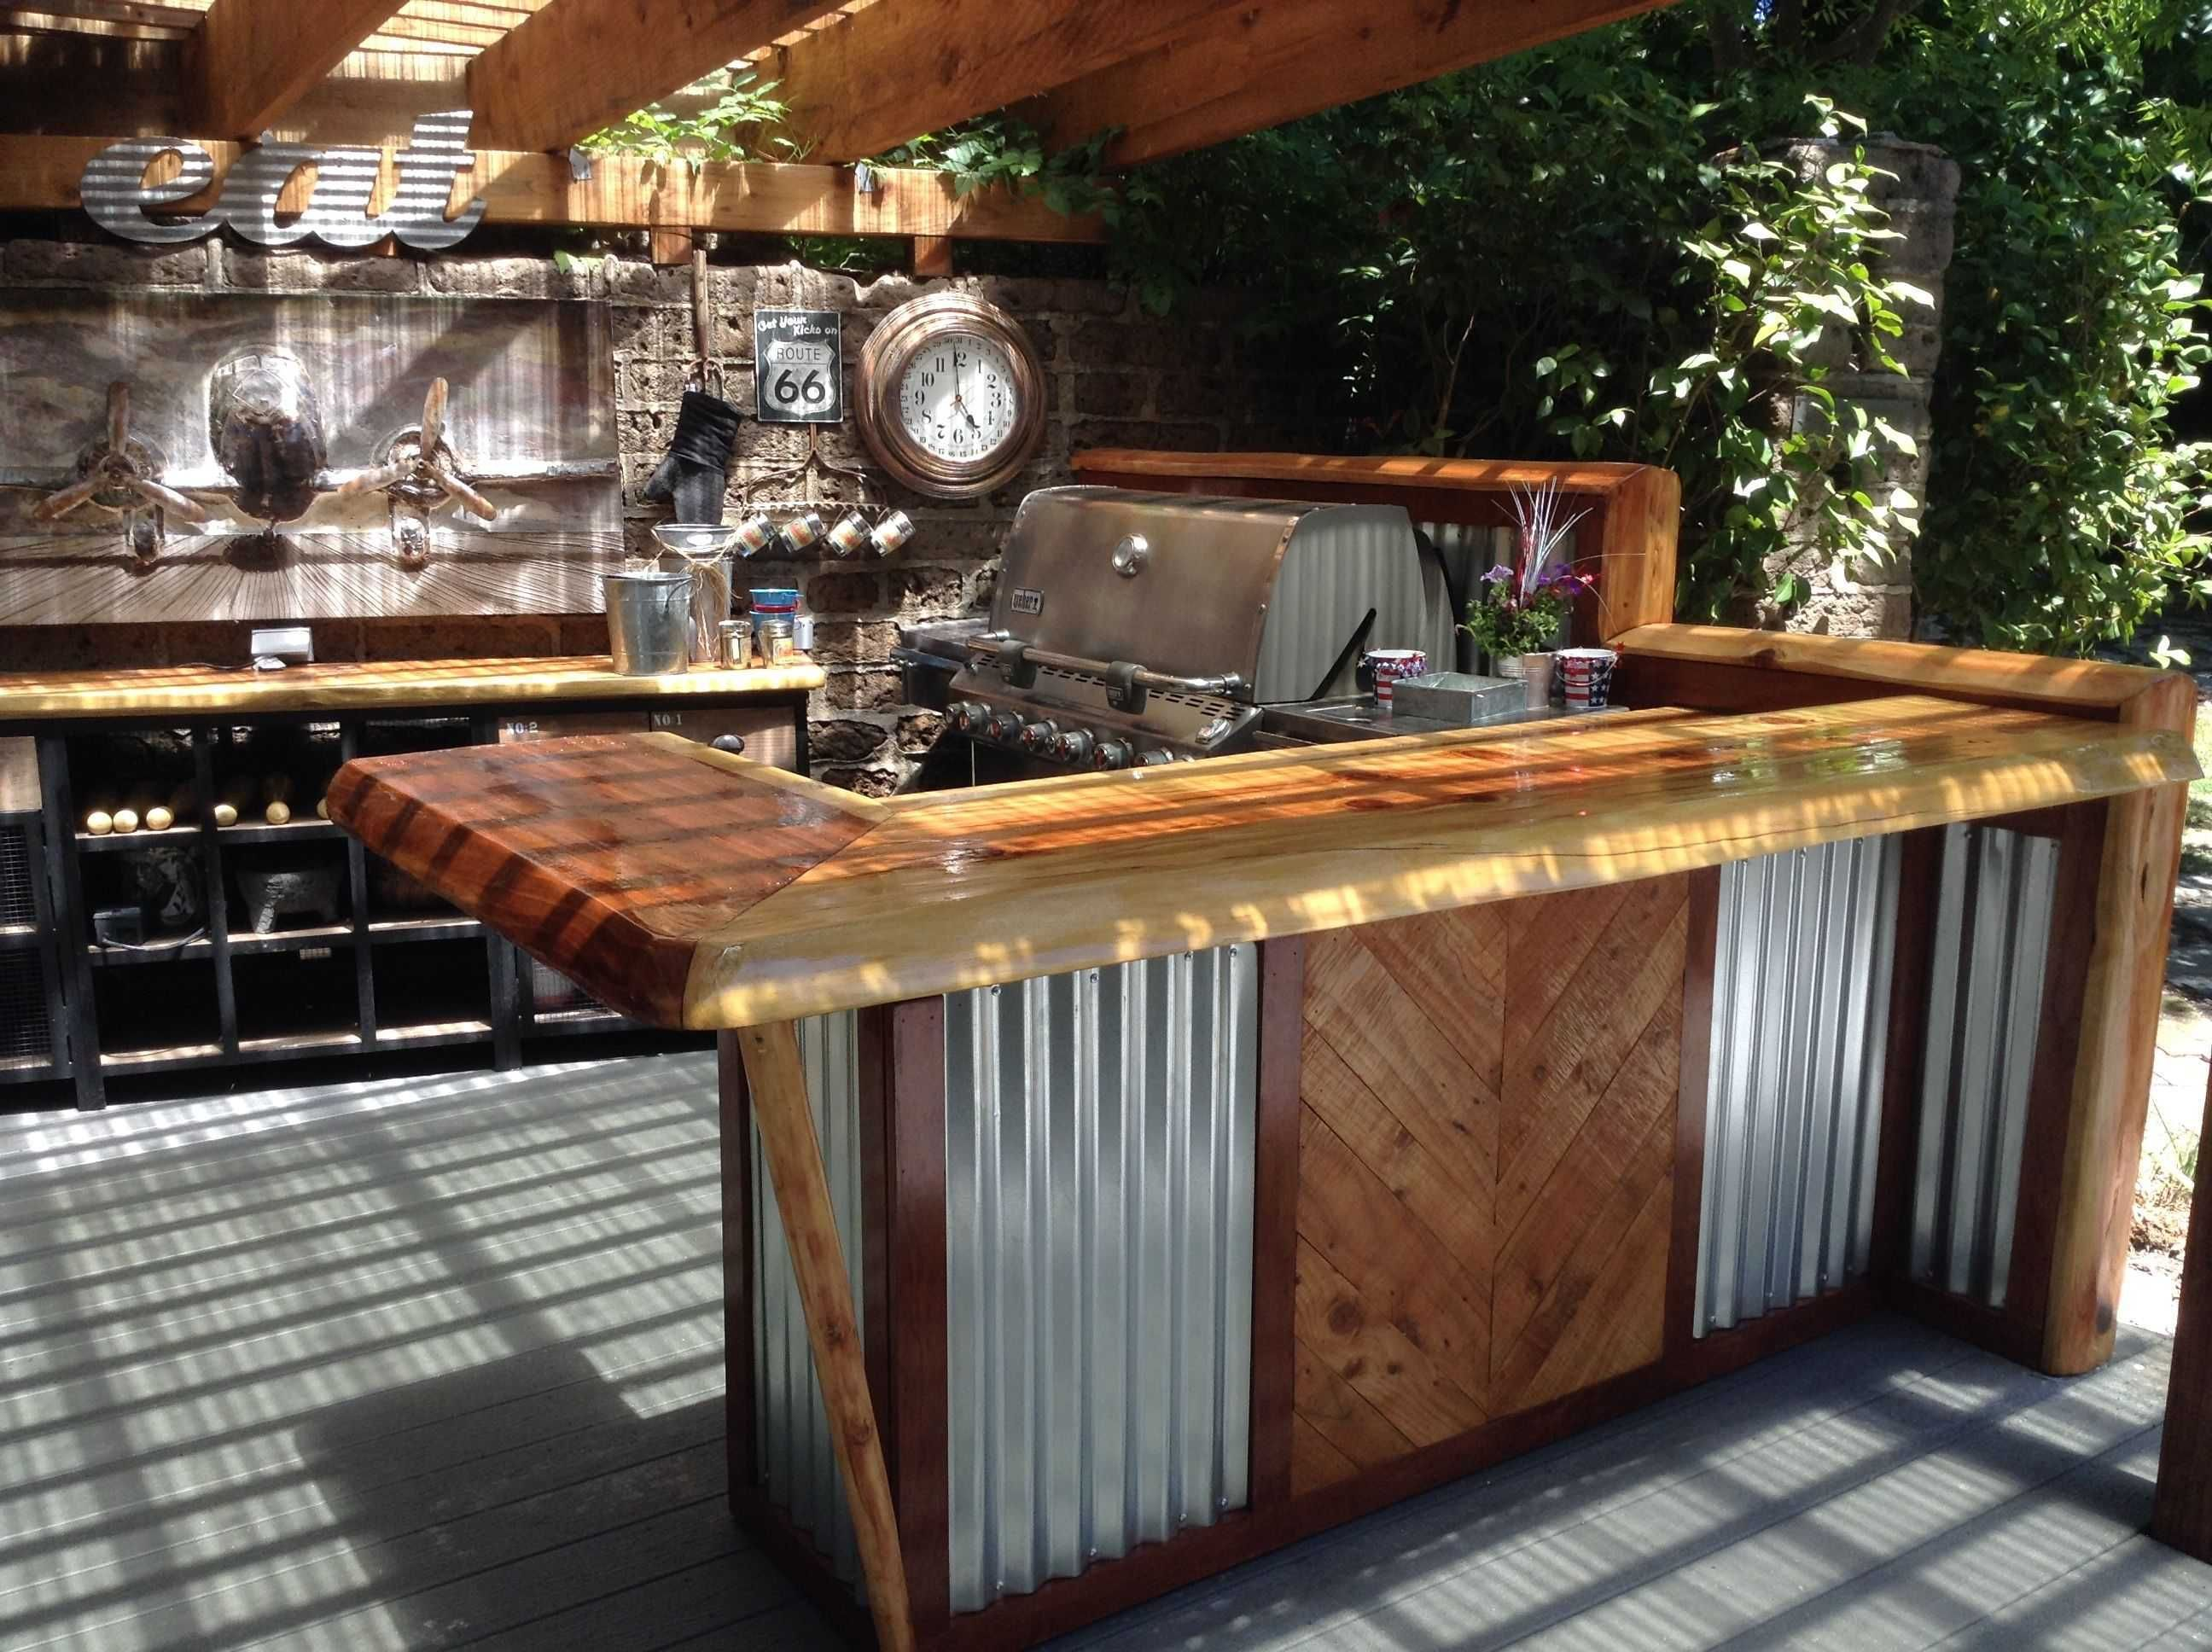 21 Incredible Outdoor Kitchen Ideas Manlikemarvinsparks Com Outdoor Kitchen Countertops Outdoor Kitchen Design Outdoor Kitchen Appliances